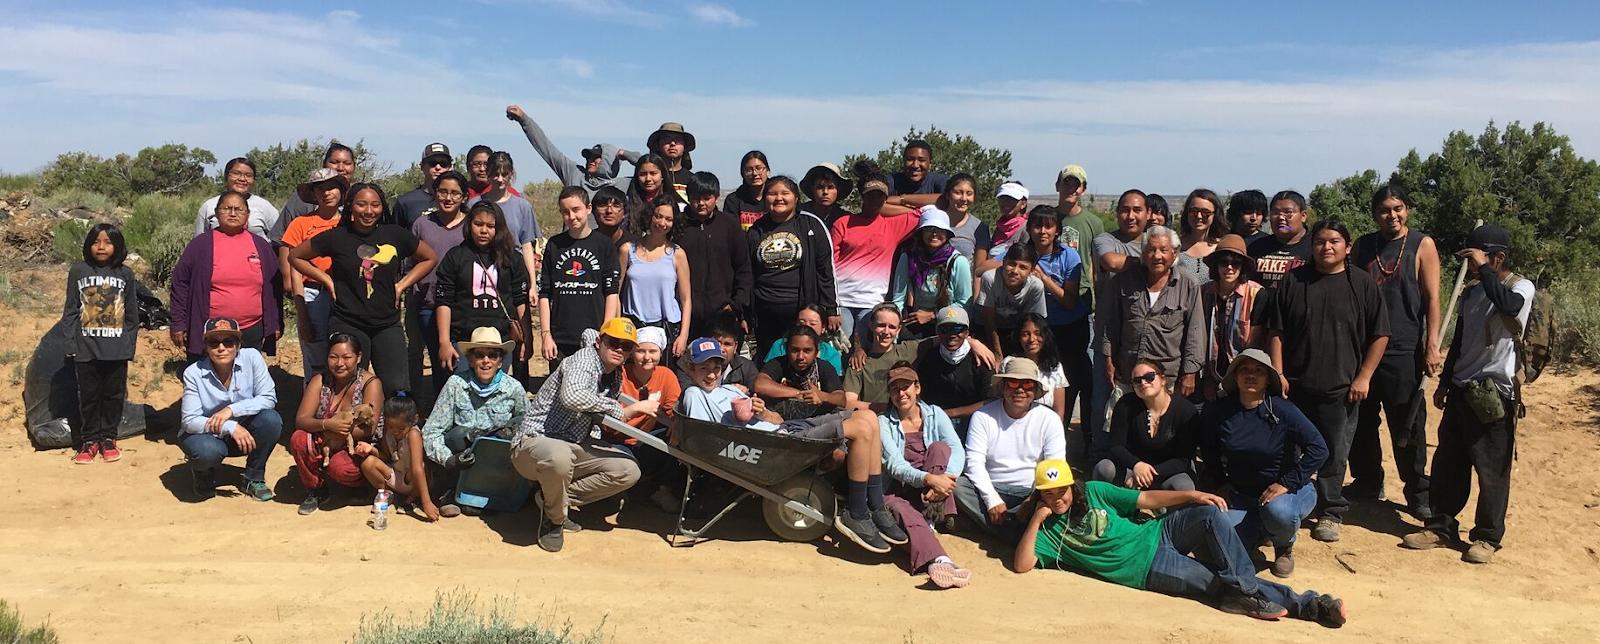 2019 Intercultural Conversations participants at the Hopi Reservation. (Photo credit: Alexis Bunten, Bioneers Indigeneity Program Co-Director)